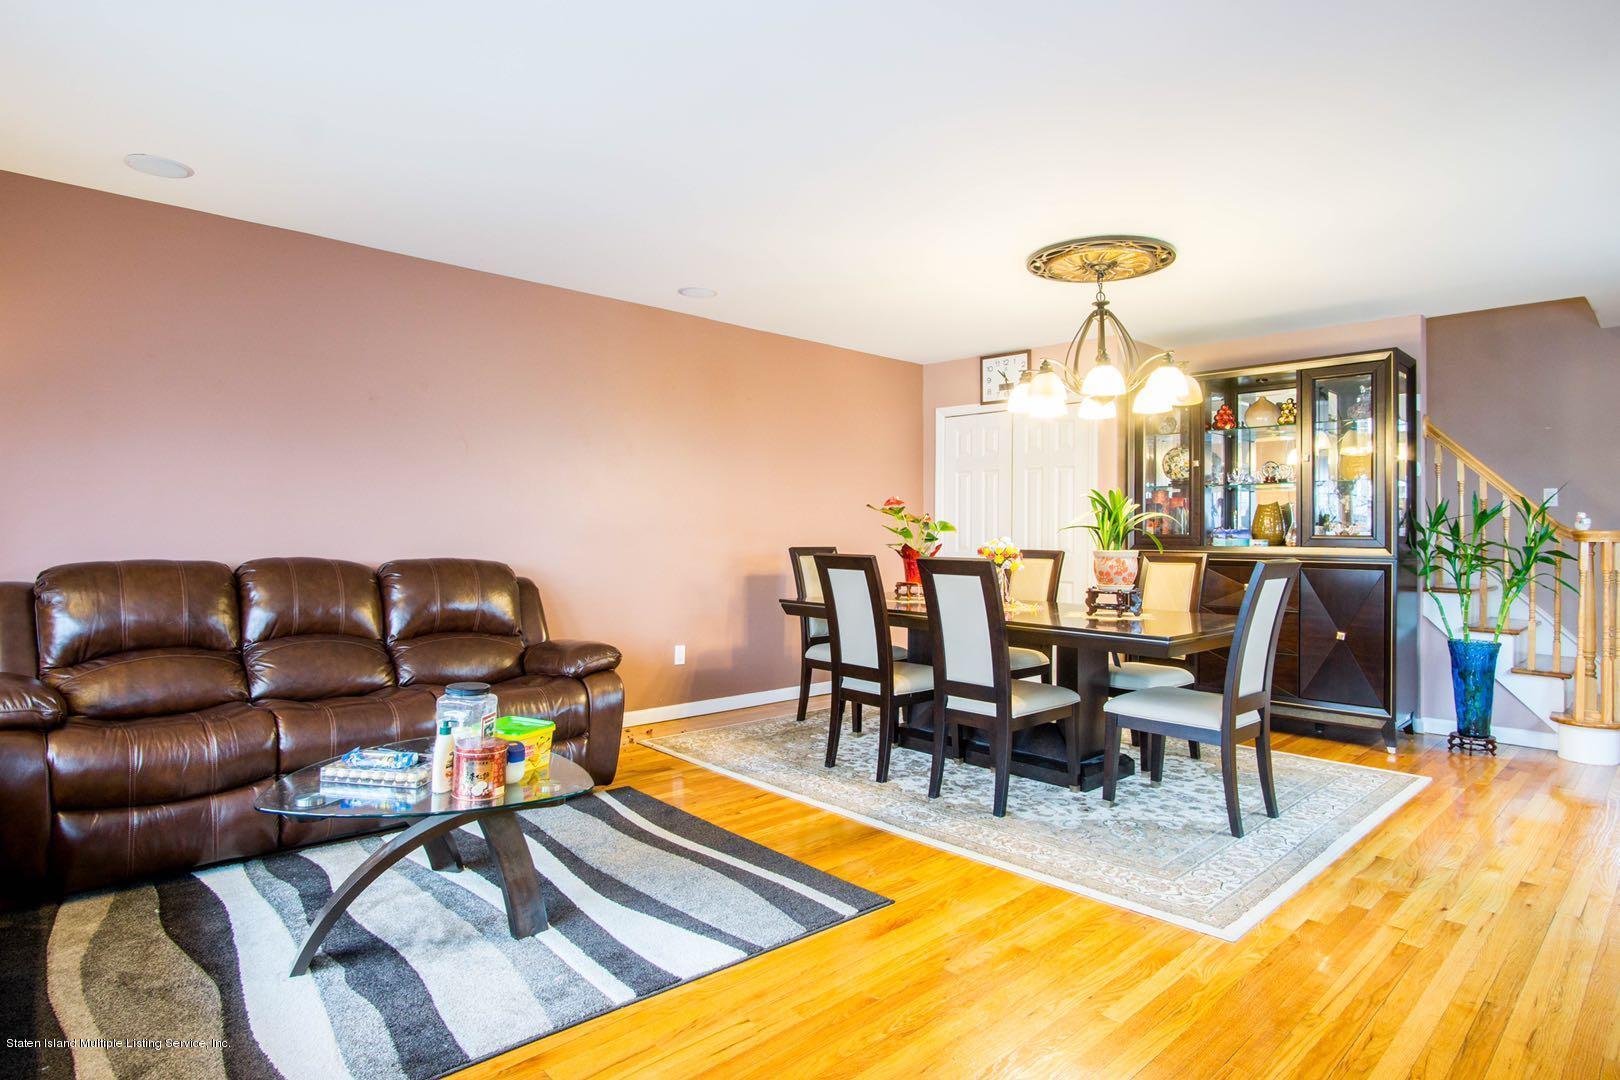 Single Family - Semi-Attached 202 Kirshon Avenue  Staten Island, NY 10314, MLS-1124892-3